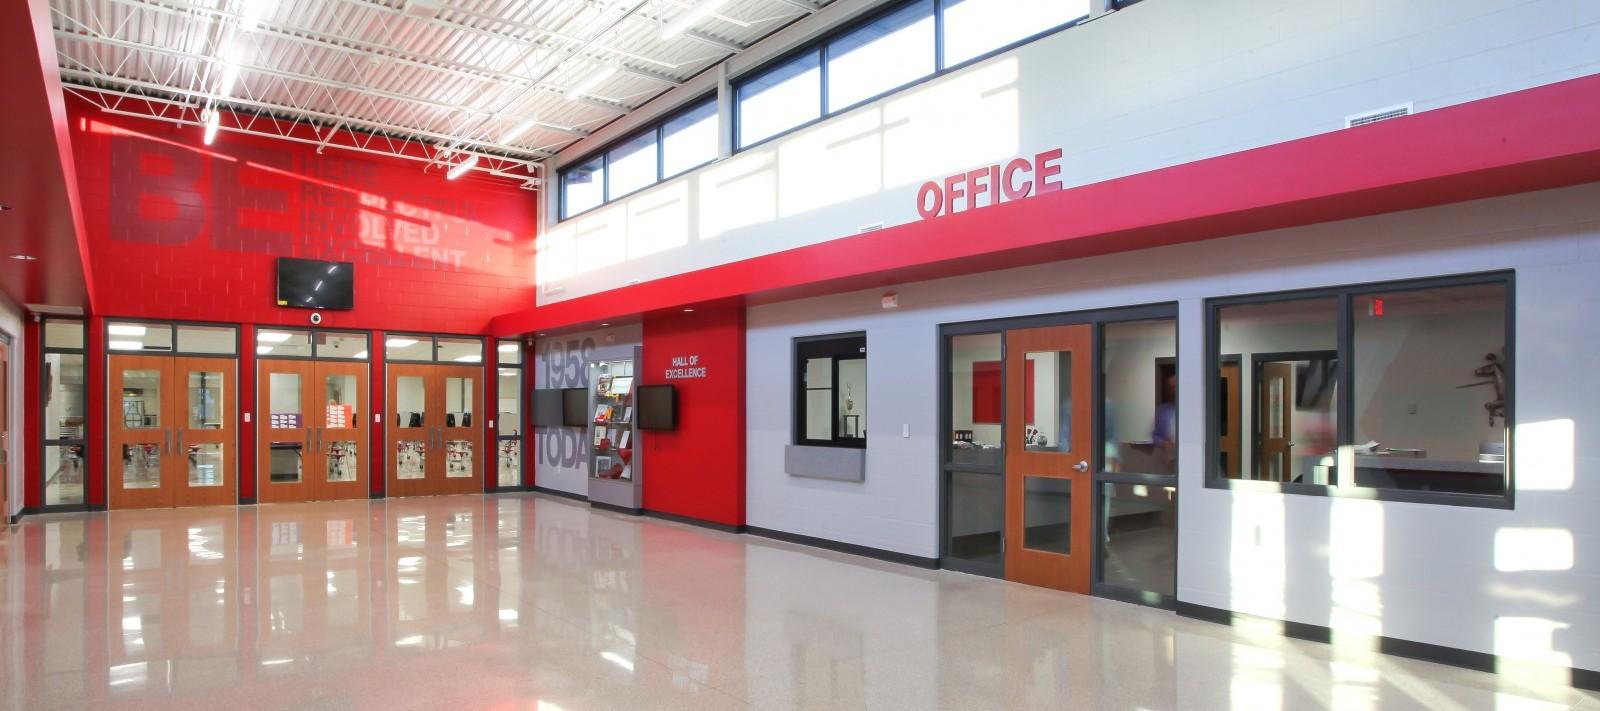 North Scott High School offices